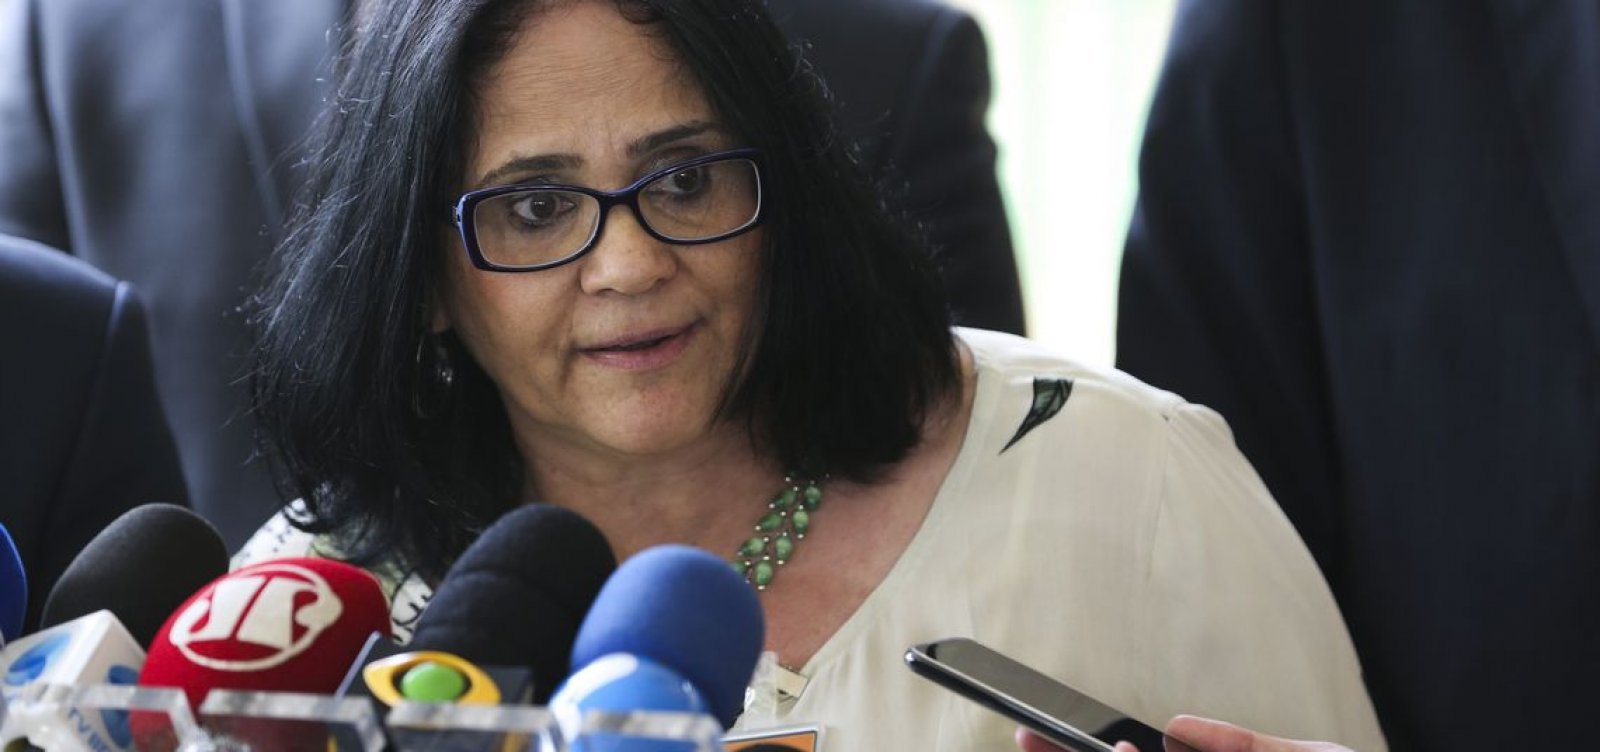 Damares elogia ministro da Saúde: 'Tenho que aplaudir o ministro Pazuello'